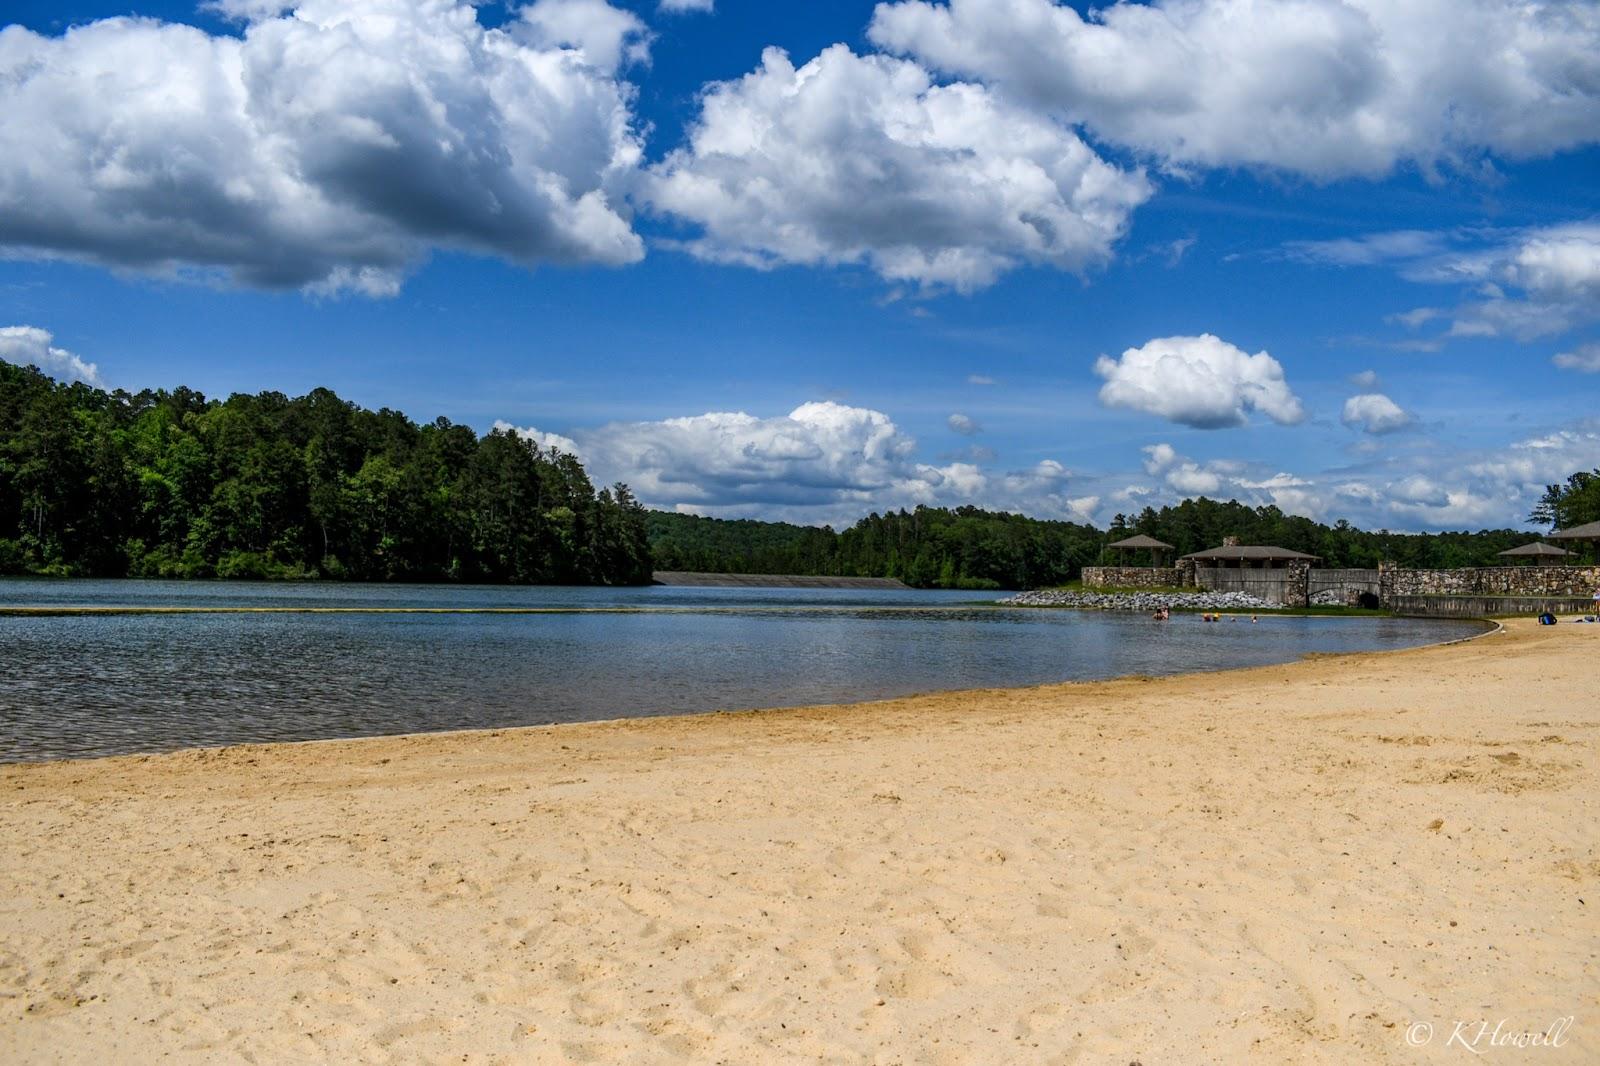 The beach area at Oak Mountain State Park in Pelham, Alabama